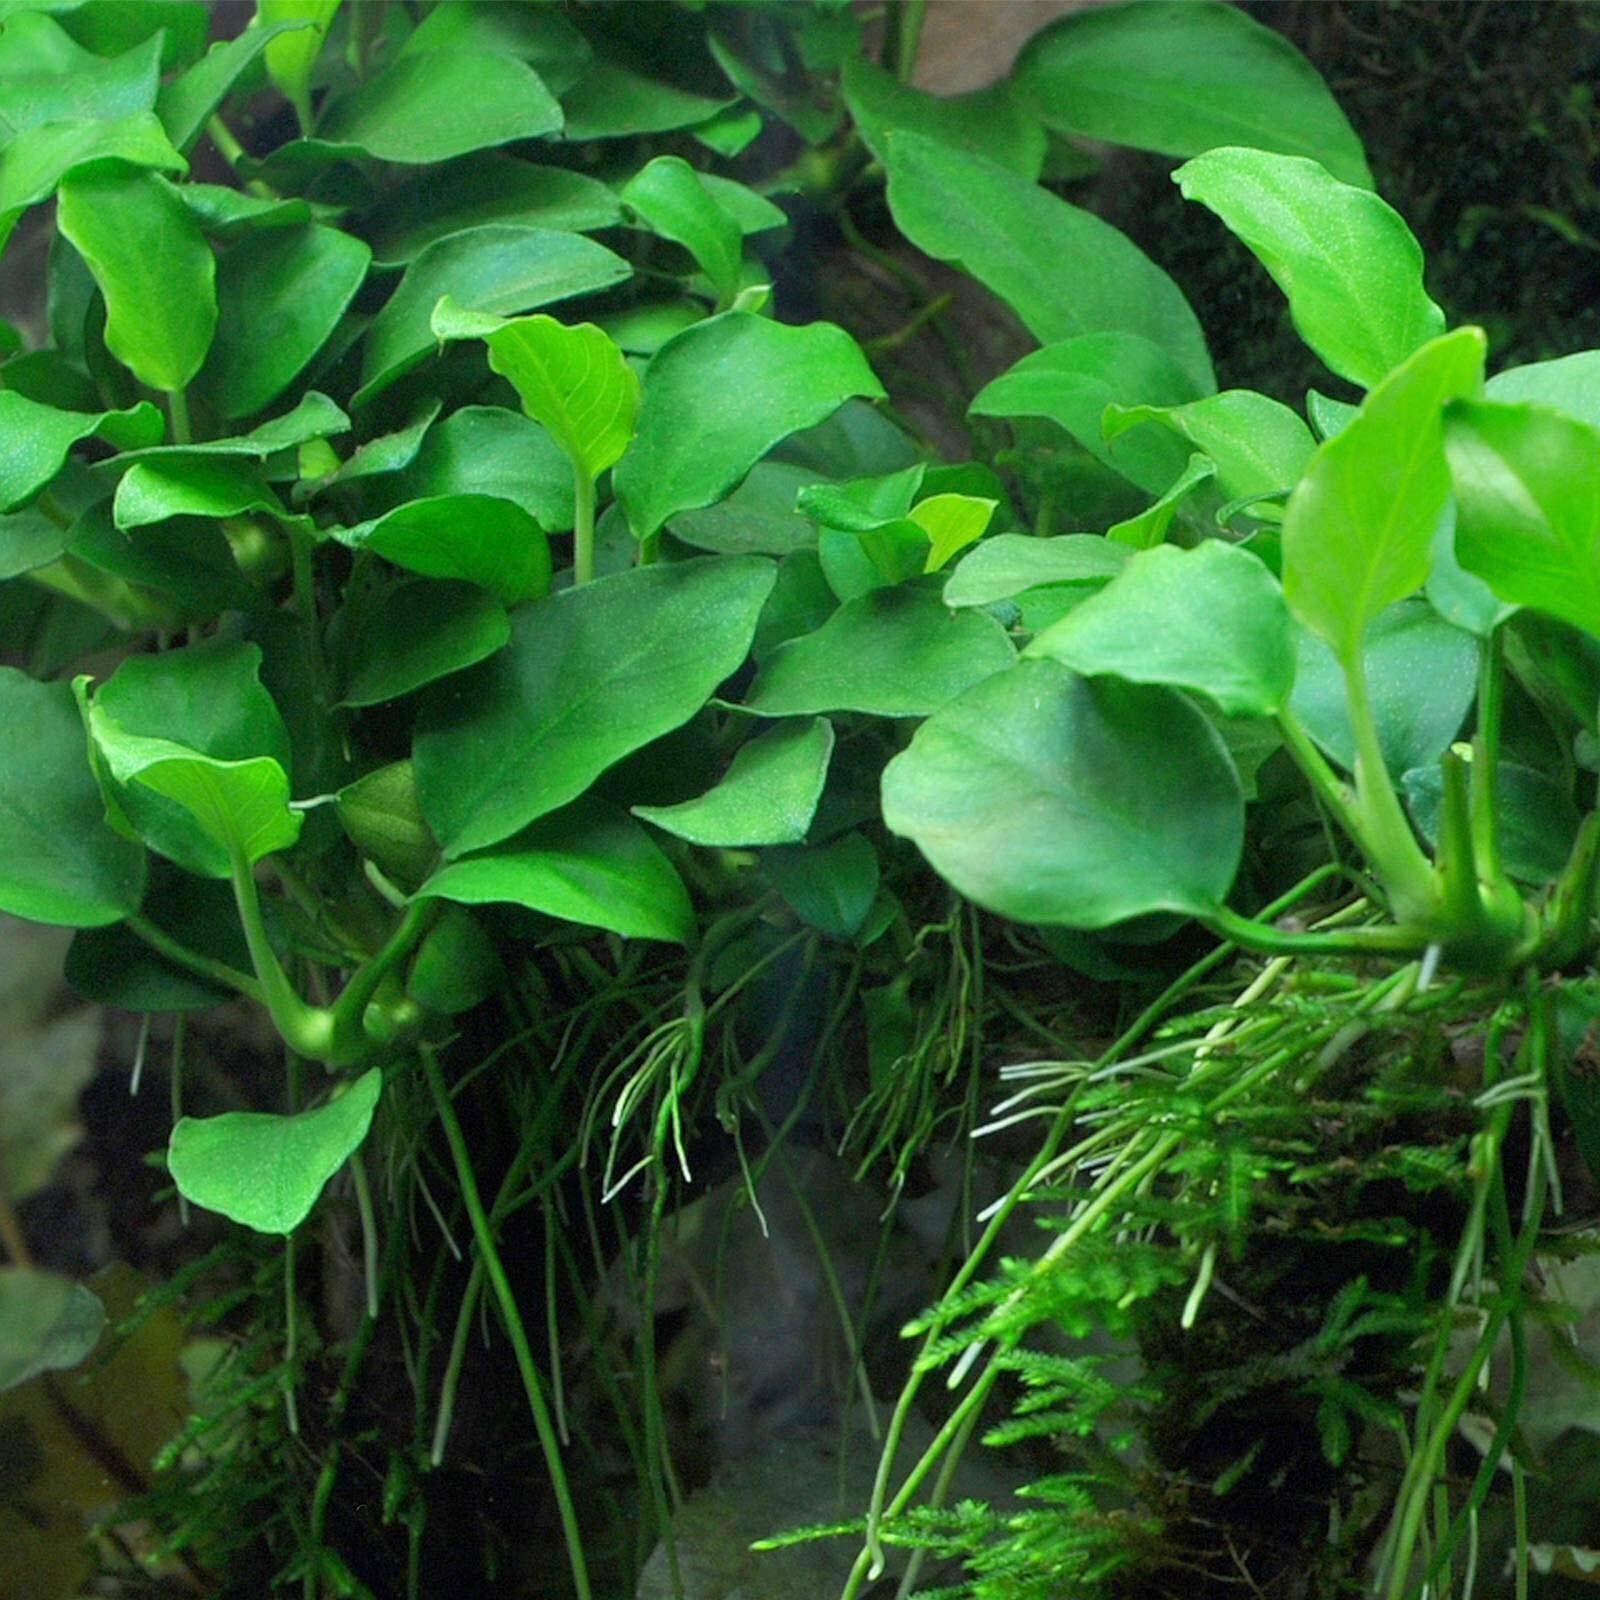 20x Anubias Petite Nana Loose Rhizome 8+ Leaf APF Aquatic Live Aquarium Plants by SS0156